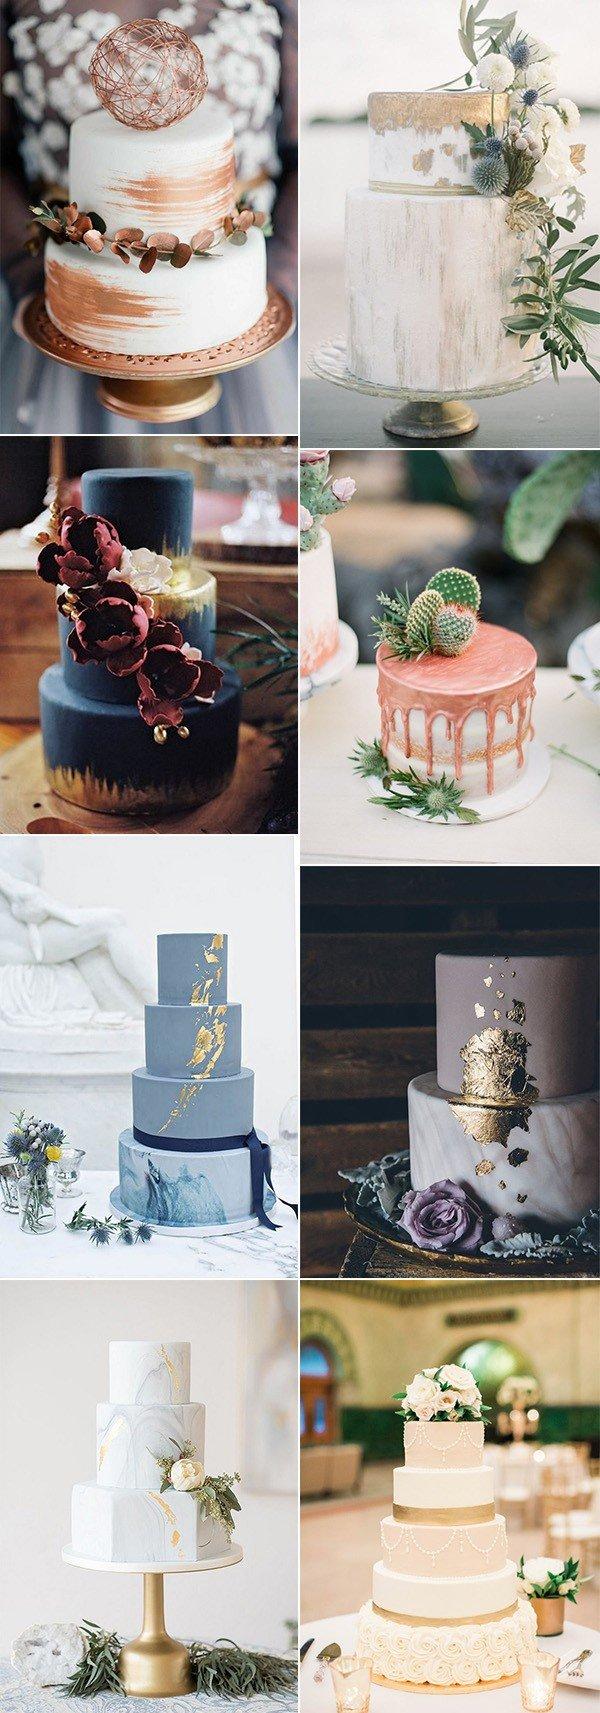 metallic wedding cake ideas